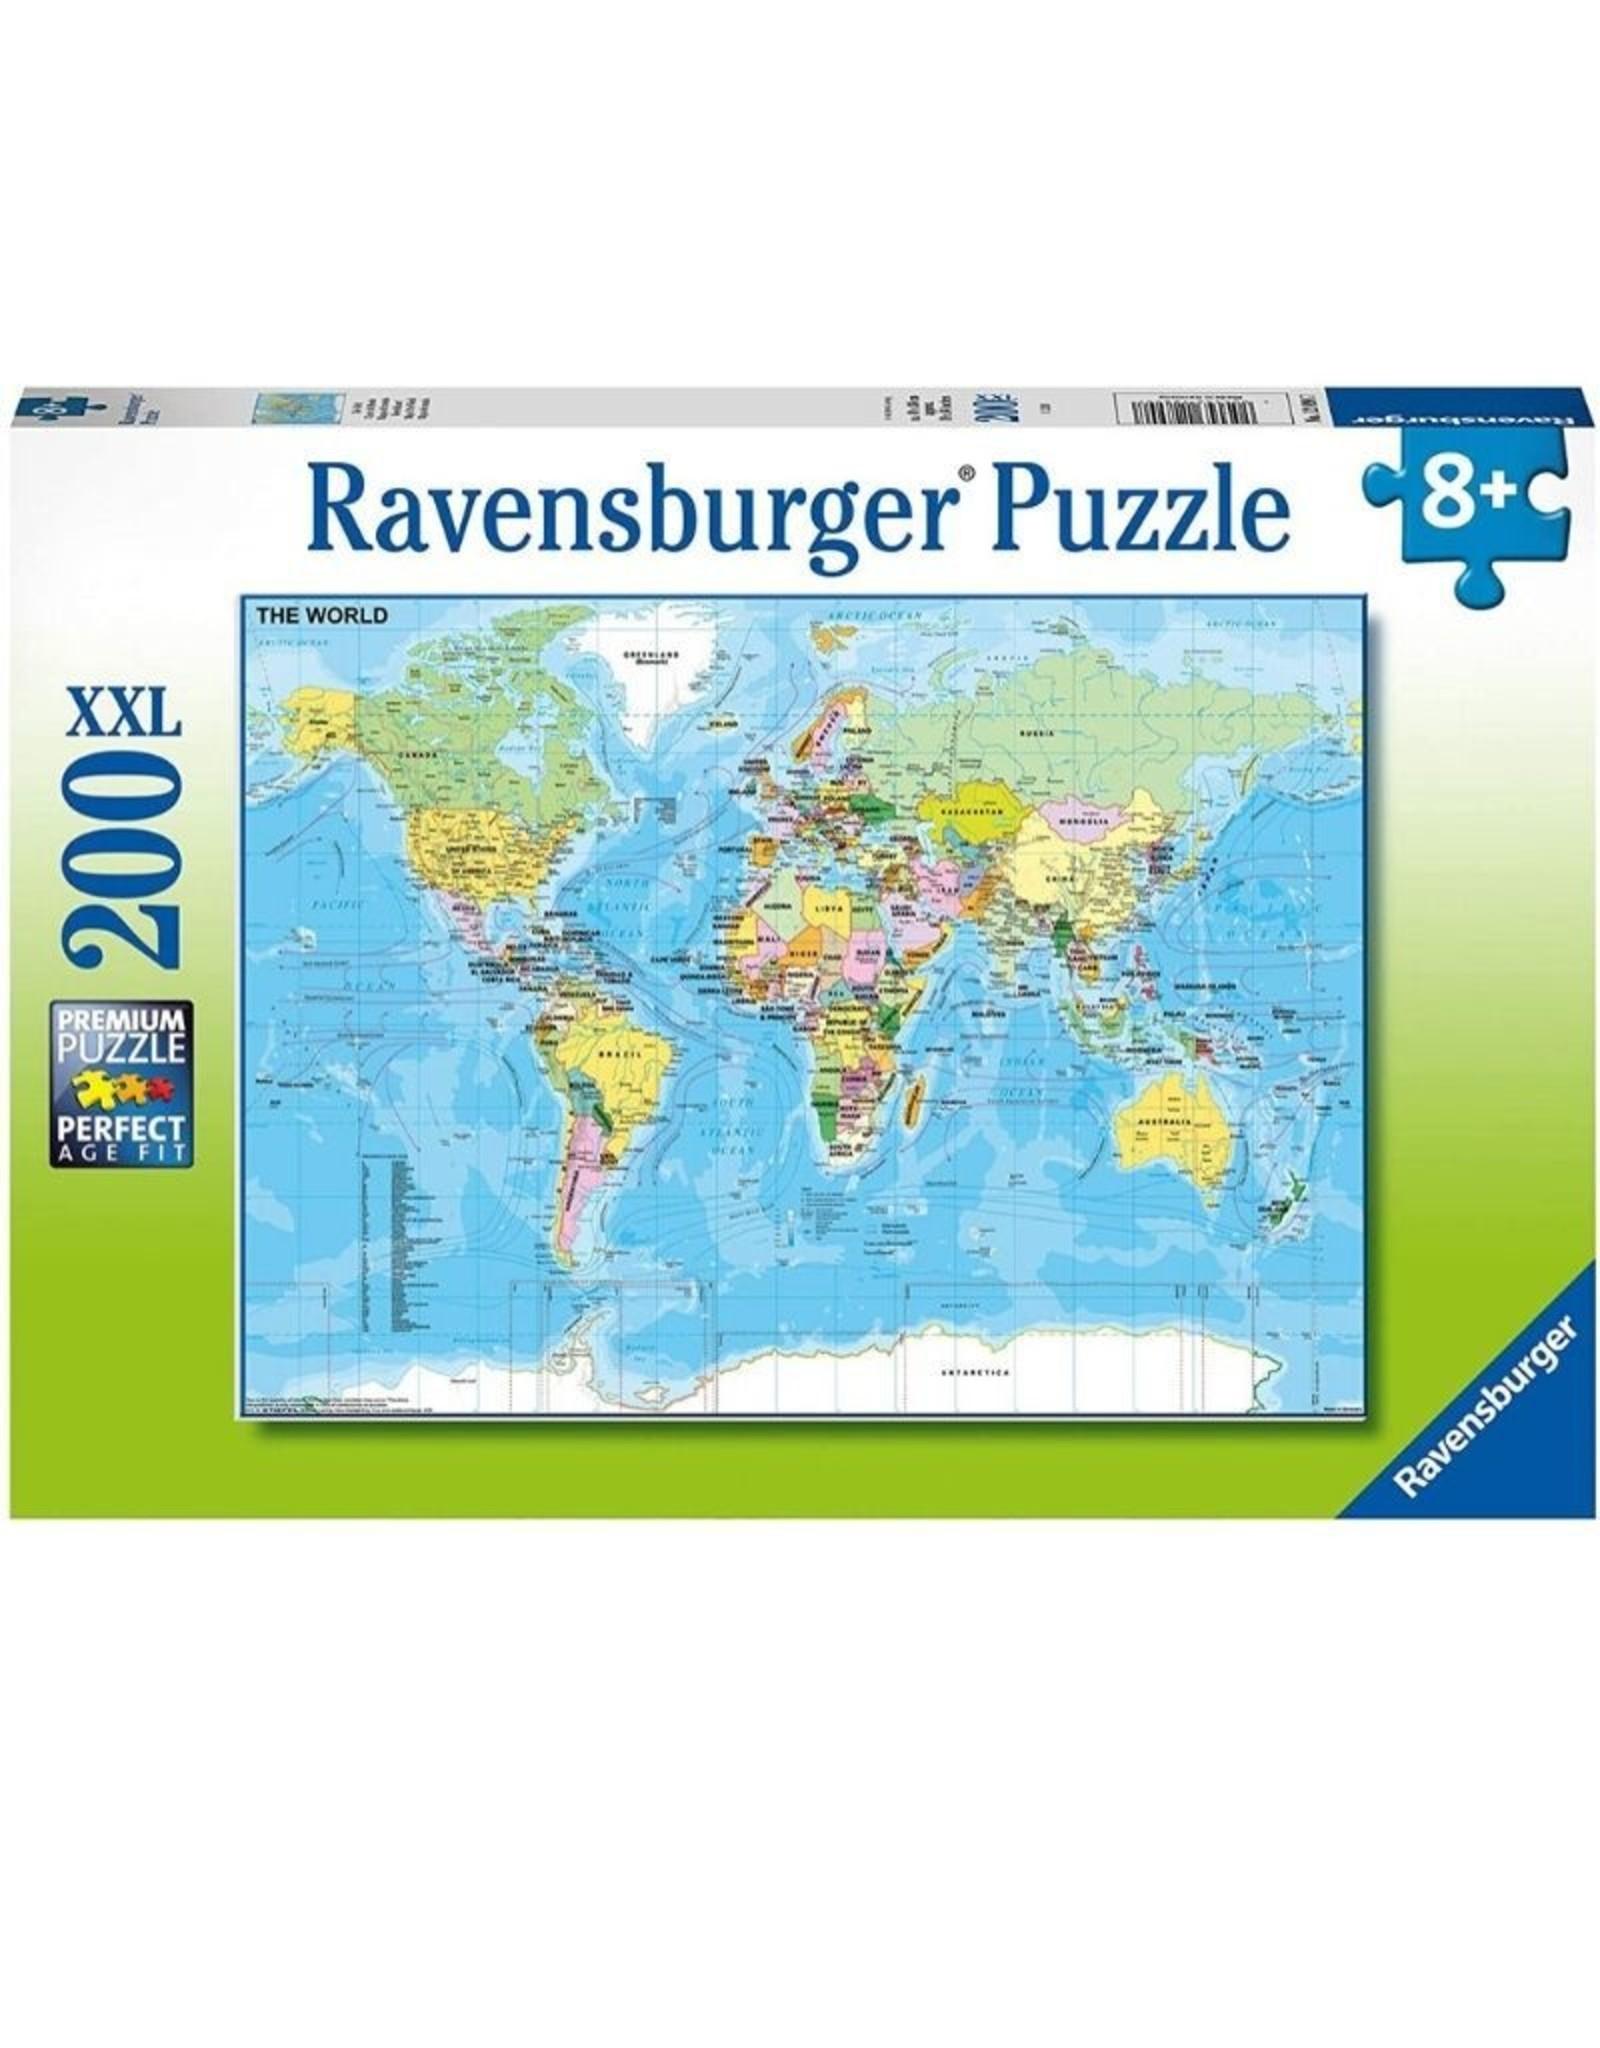 Ravensburger 12890 Map of the World